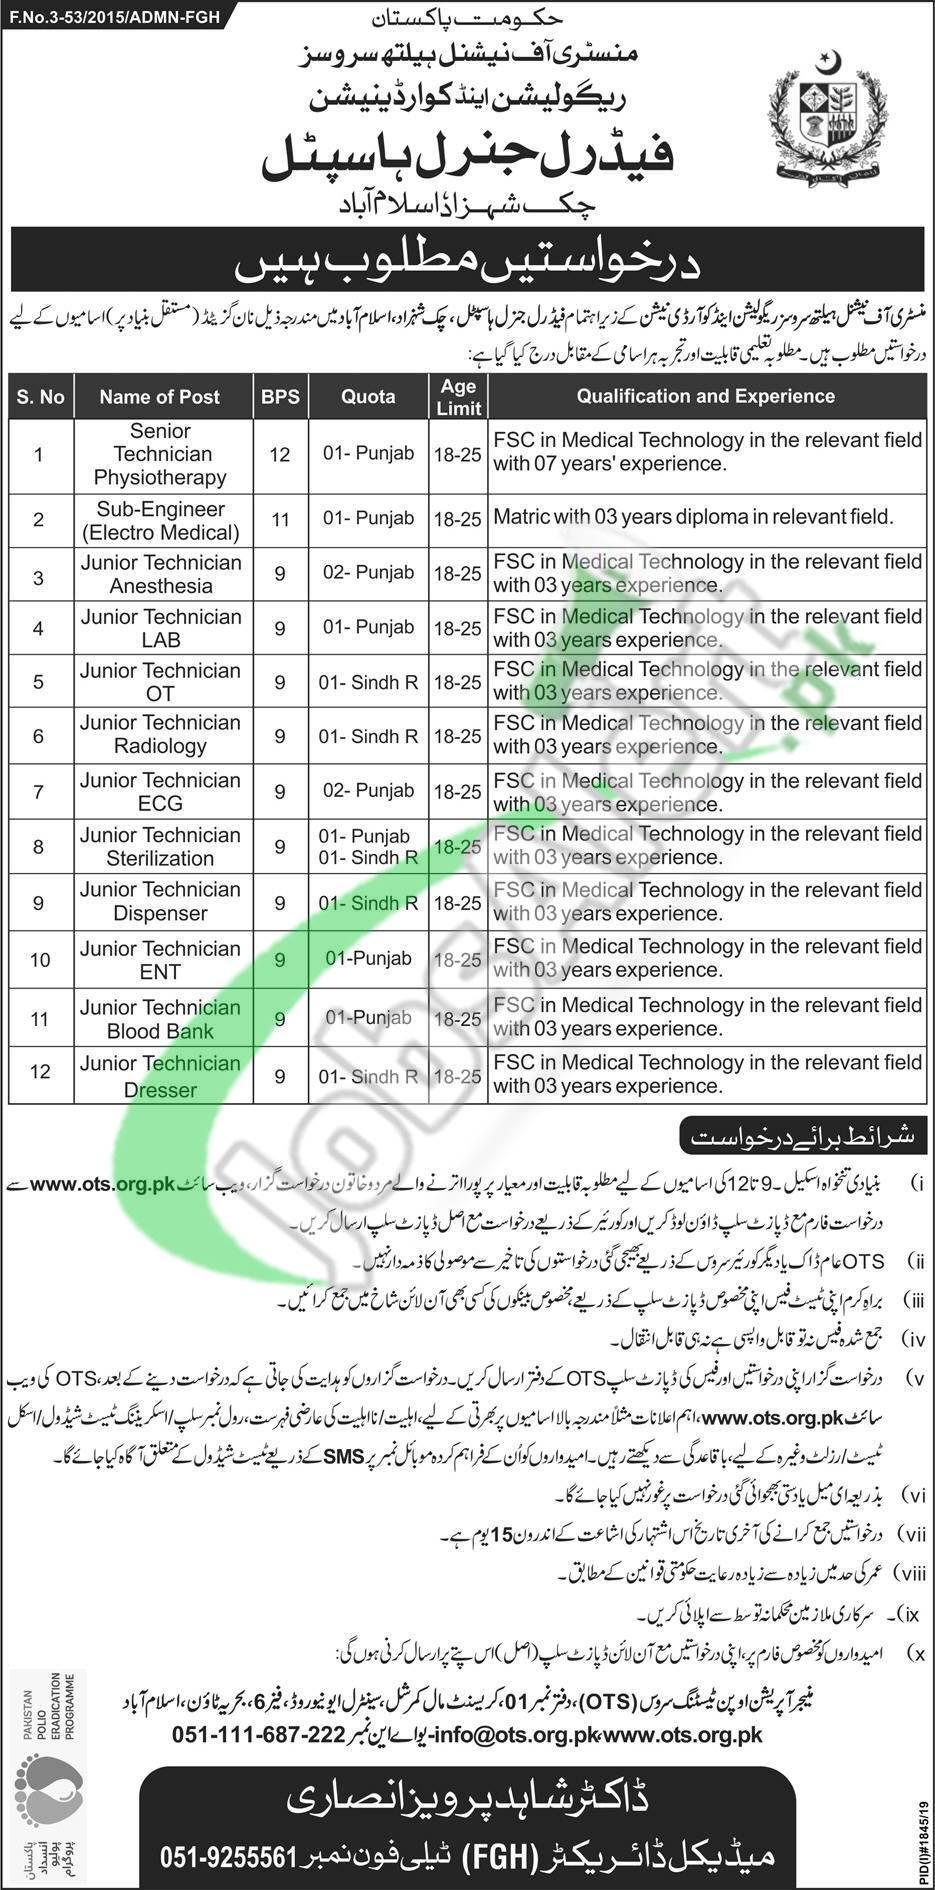 Federal General Hospital Chak Shahzad Islamabad Jobs 2019